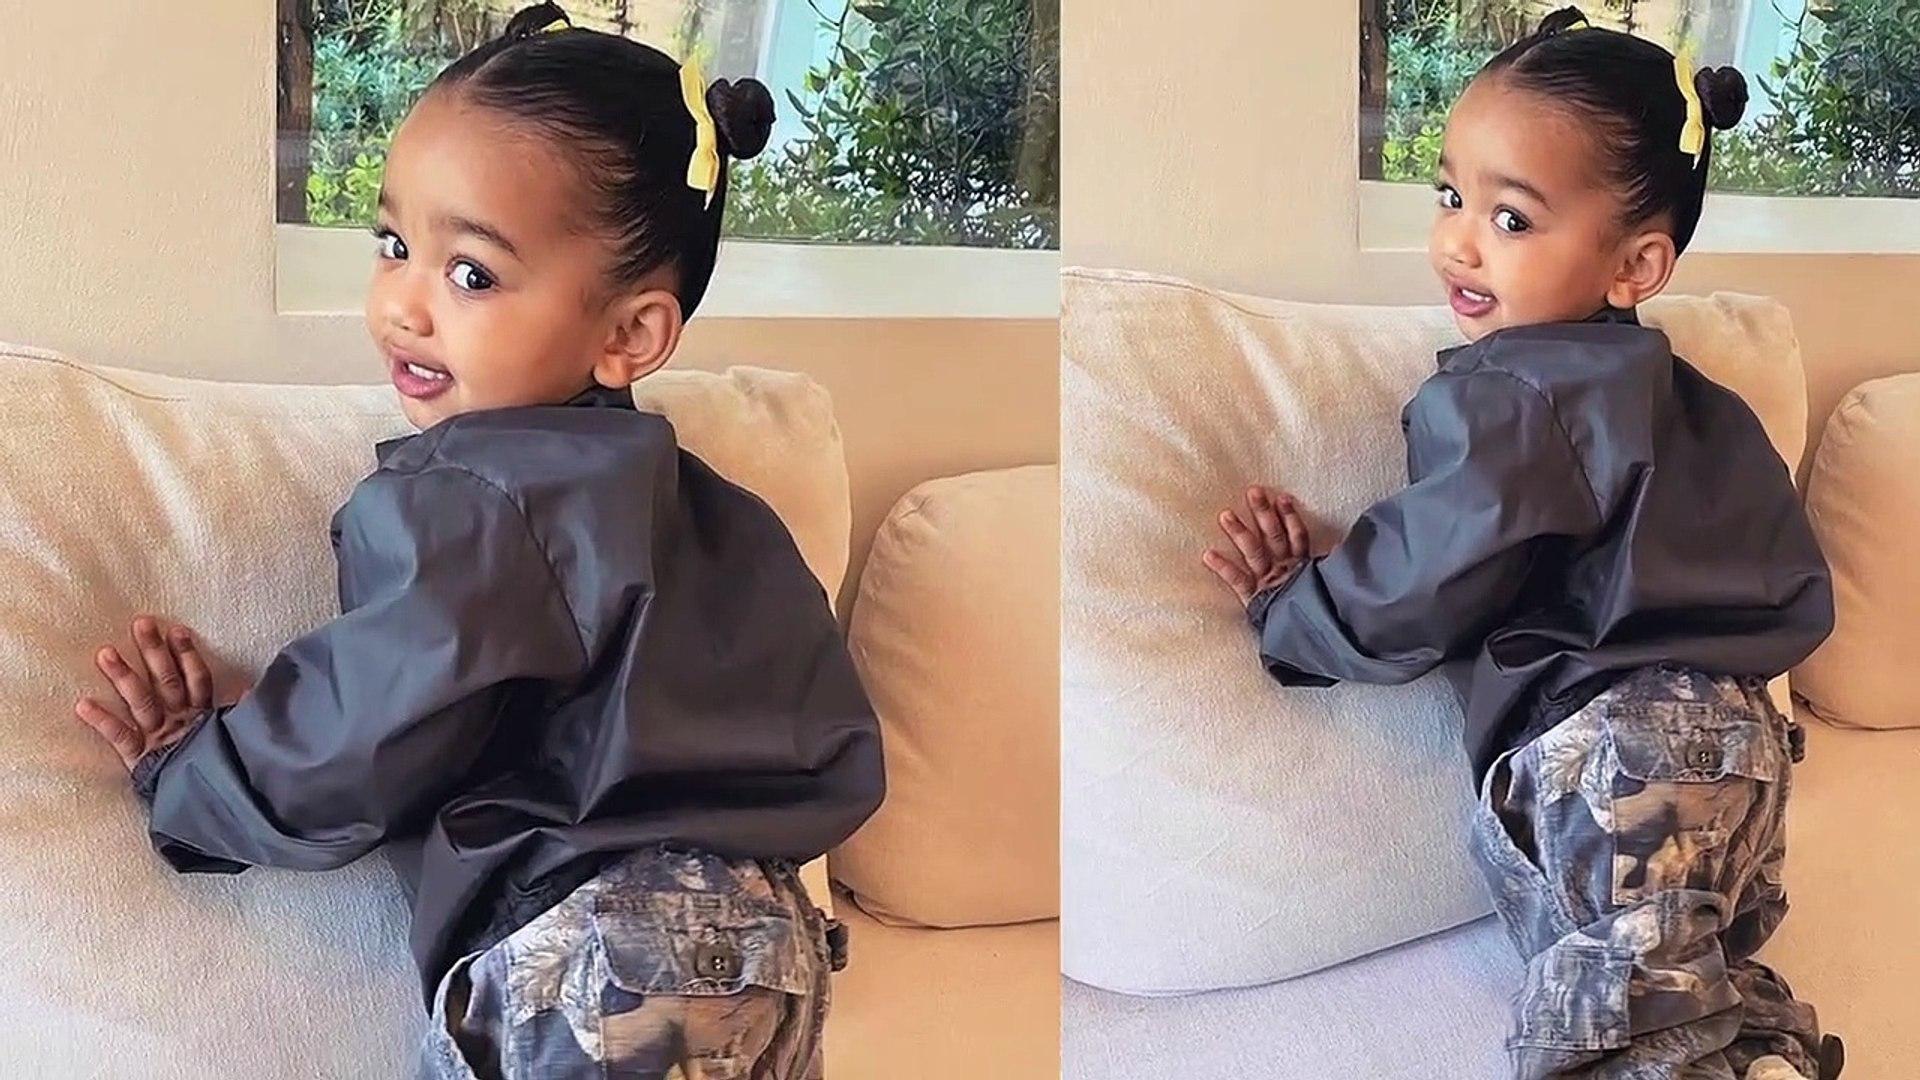 Chicago West Gets Stitches, Kim Kardashian Daily Routine Revealed